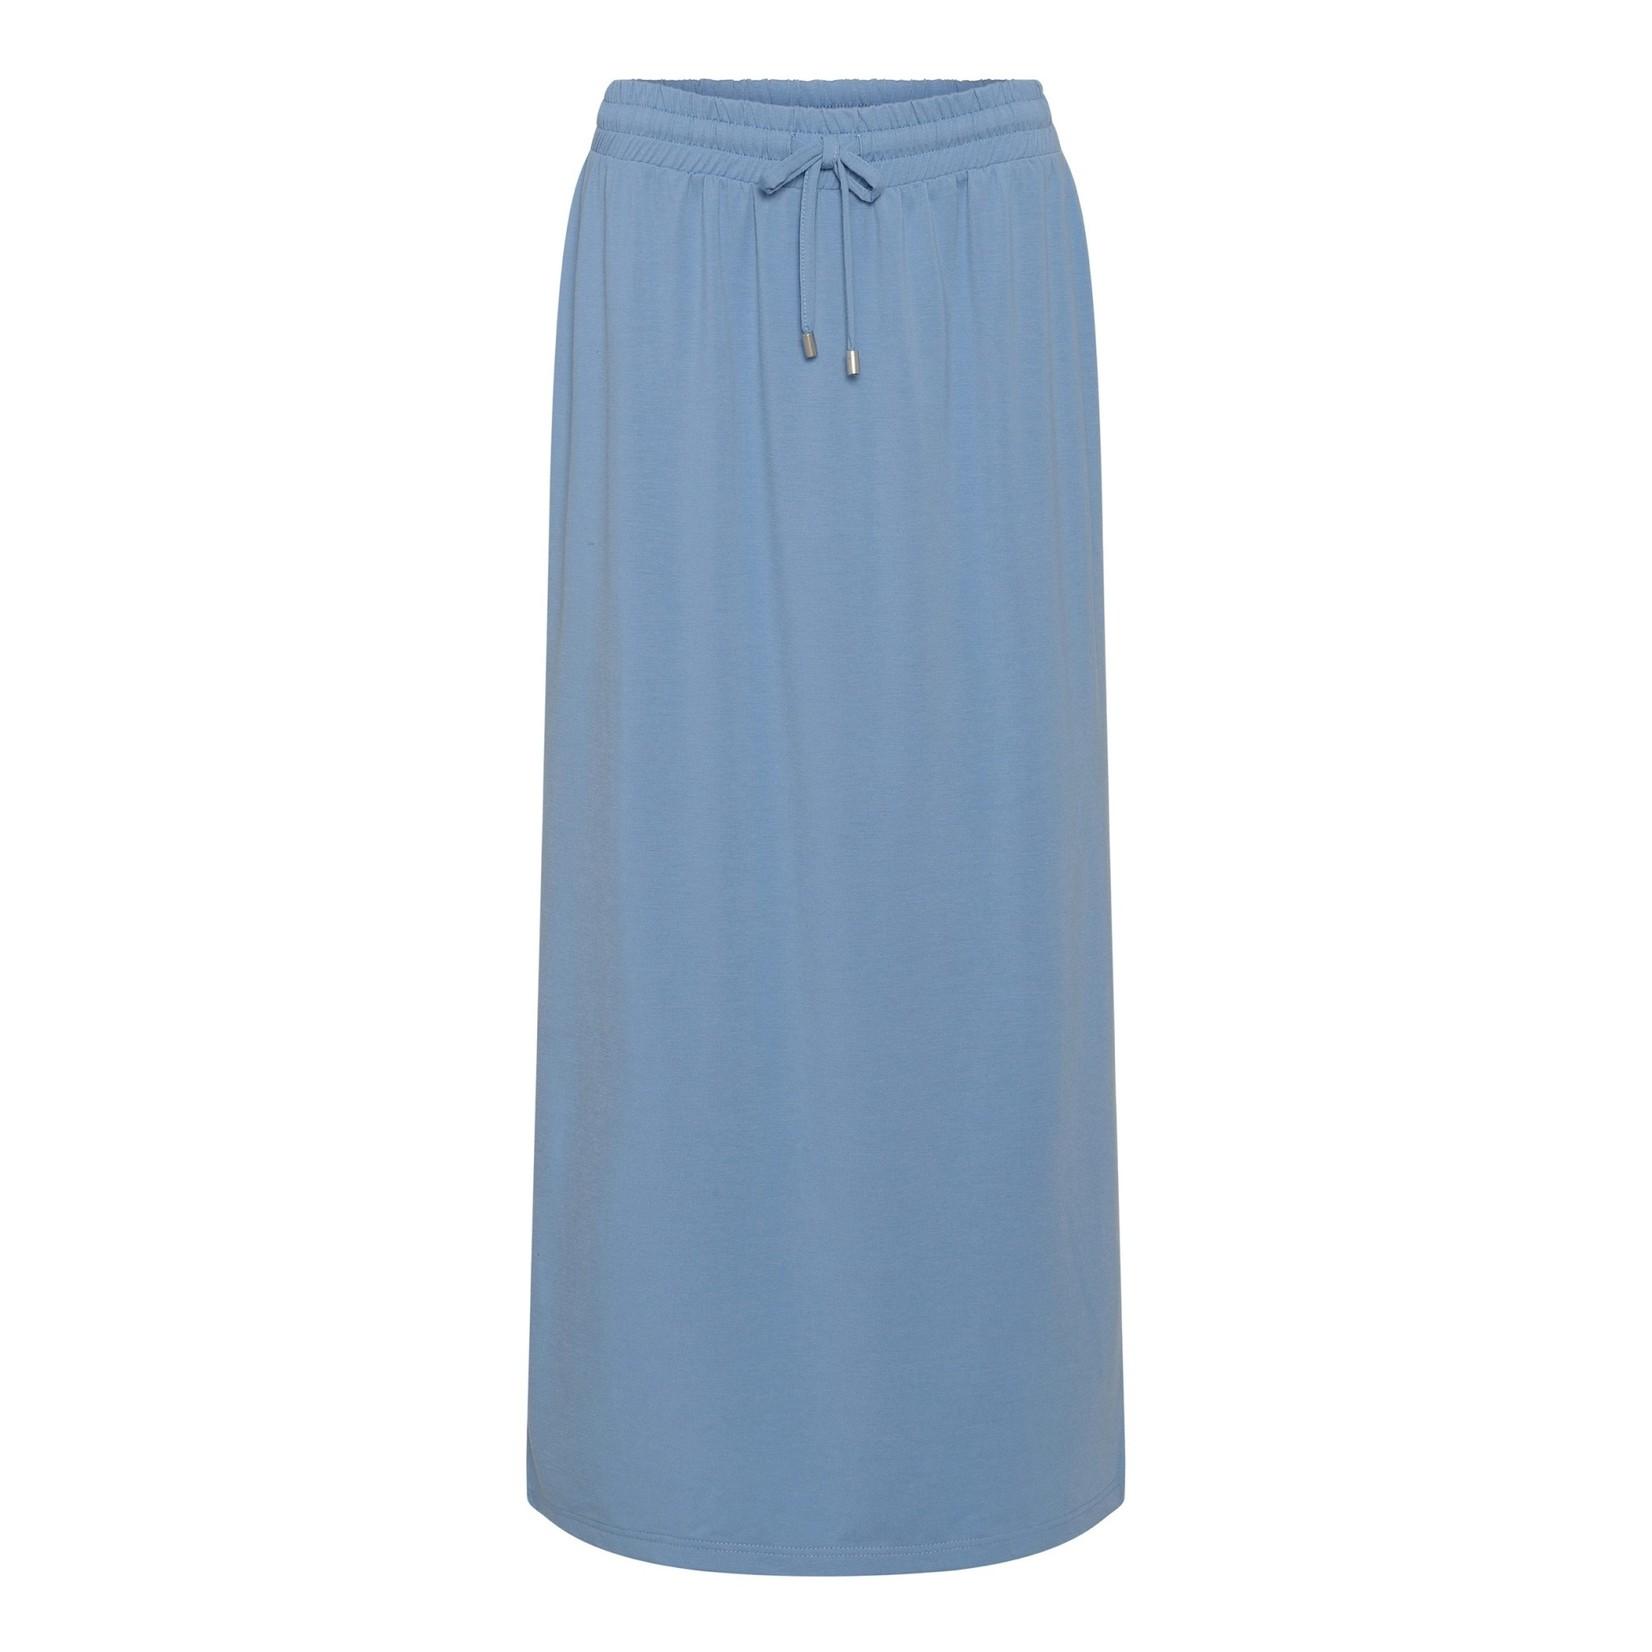 Costa & Mani Costa Mani marie skirt bleu 2101847